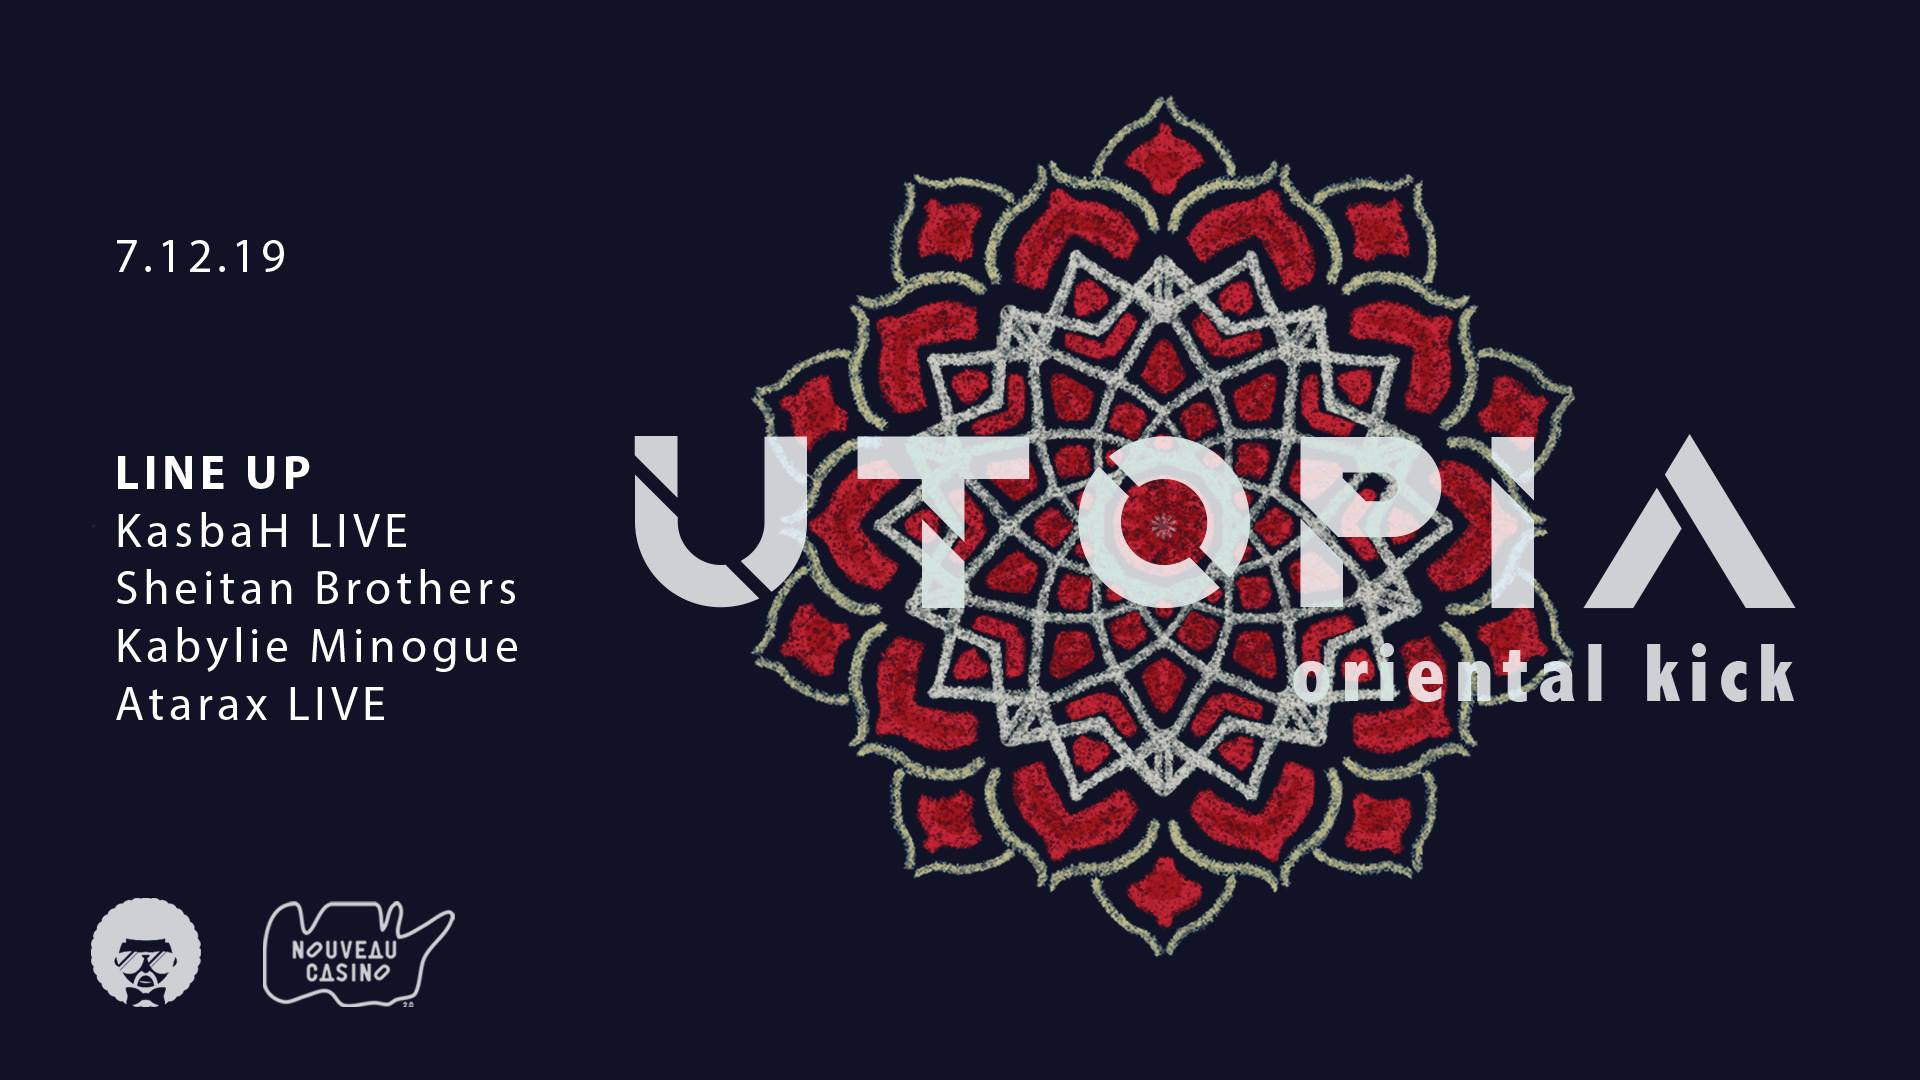 Utopia : Oriental Kick